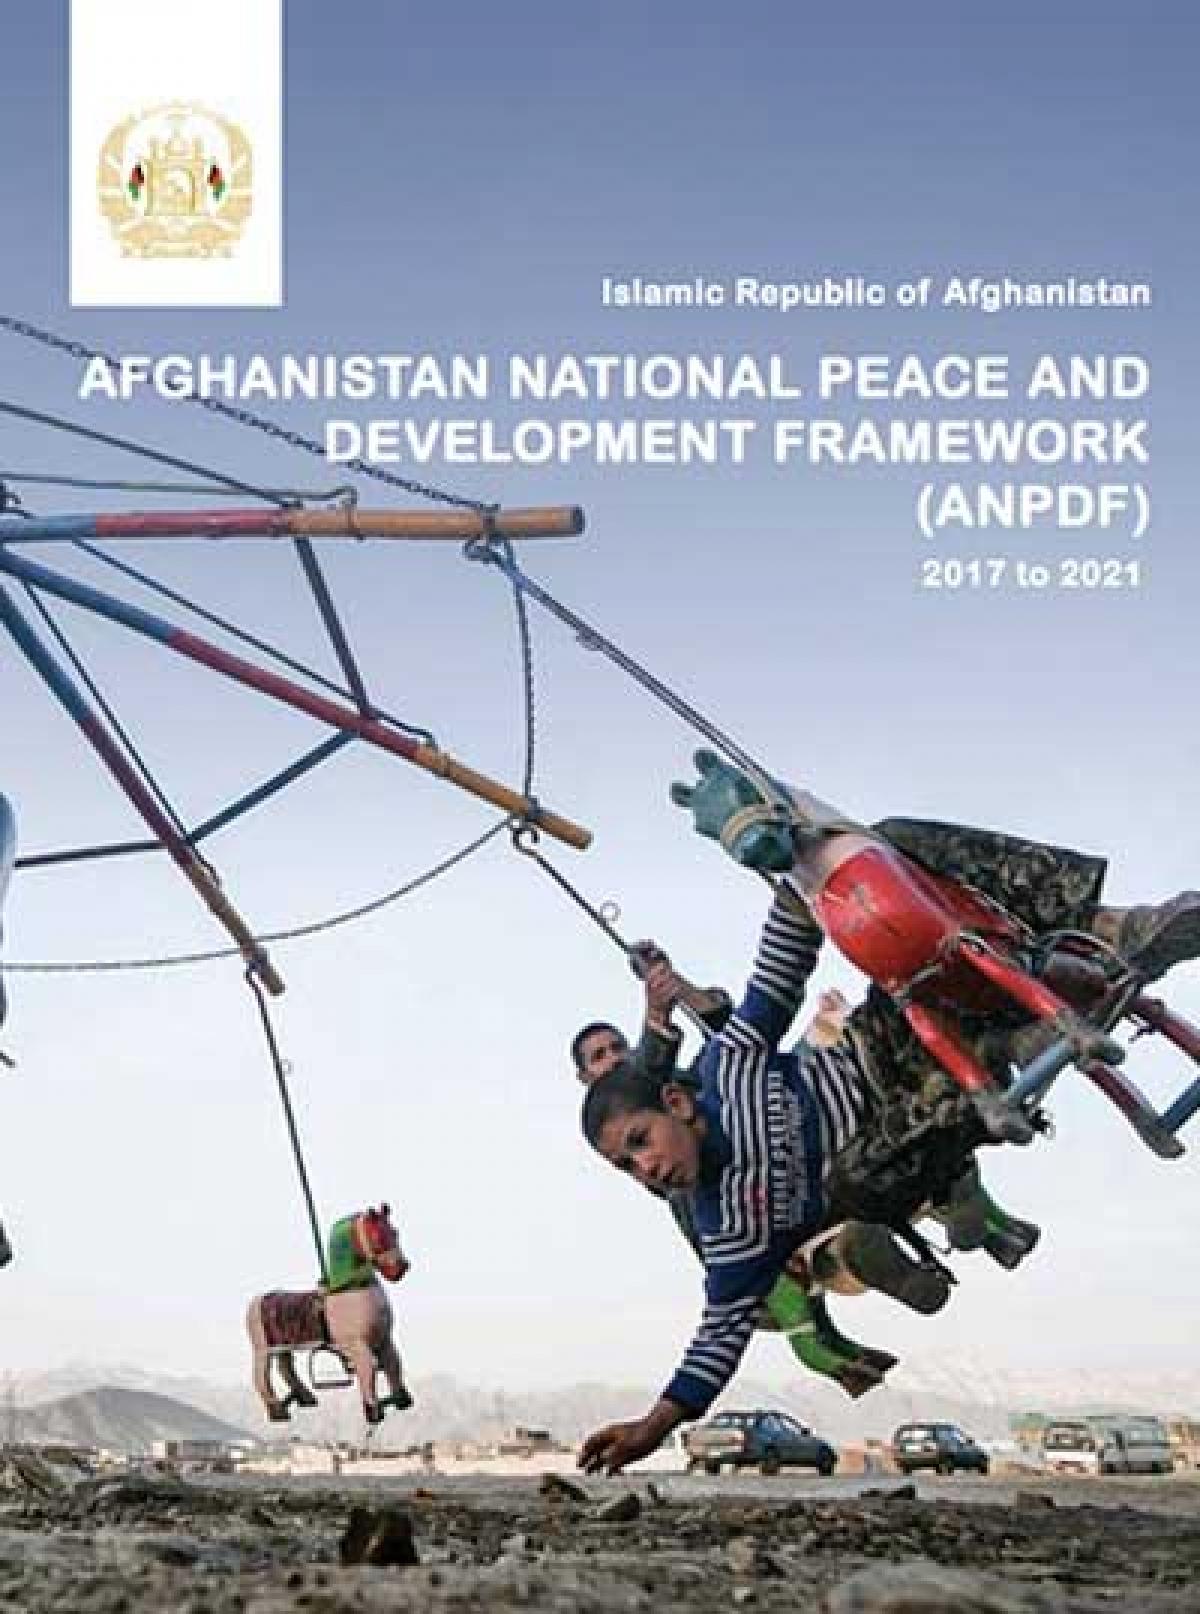 AFGHANISTAN NATIONAL PEACE AND DEVELOPMENT-FRAMEWORK